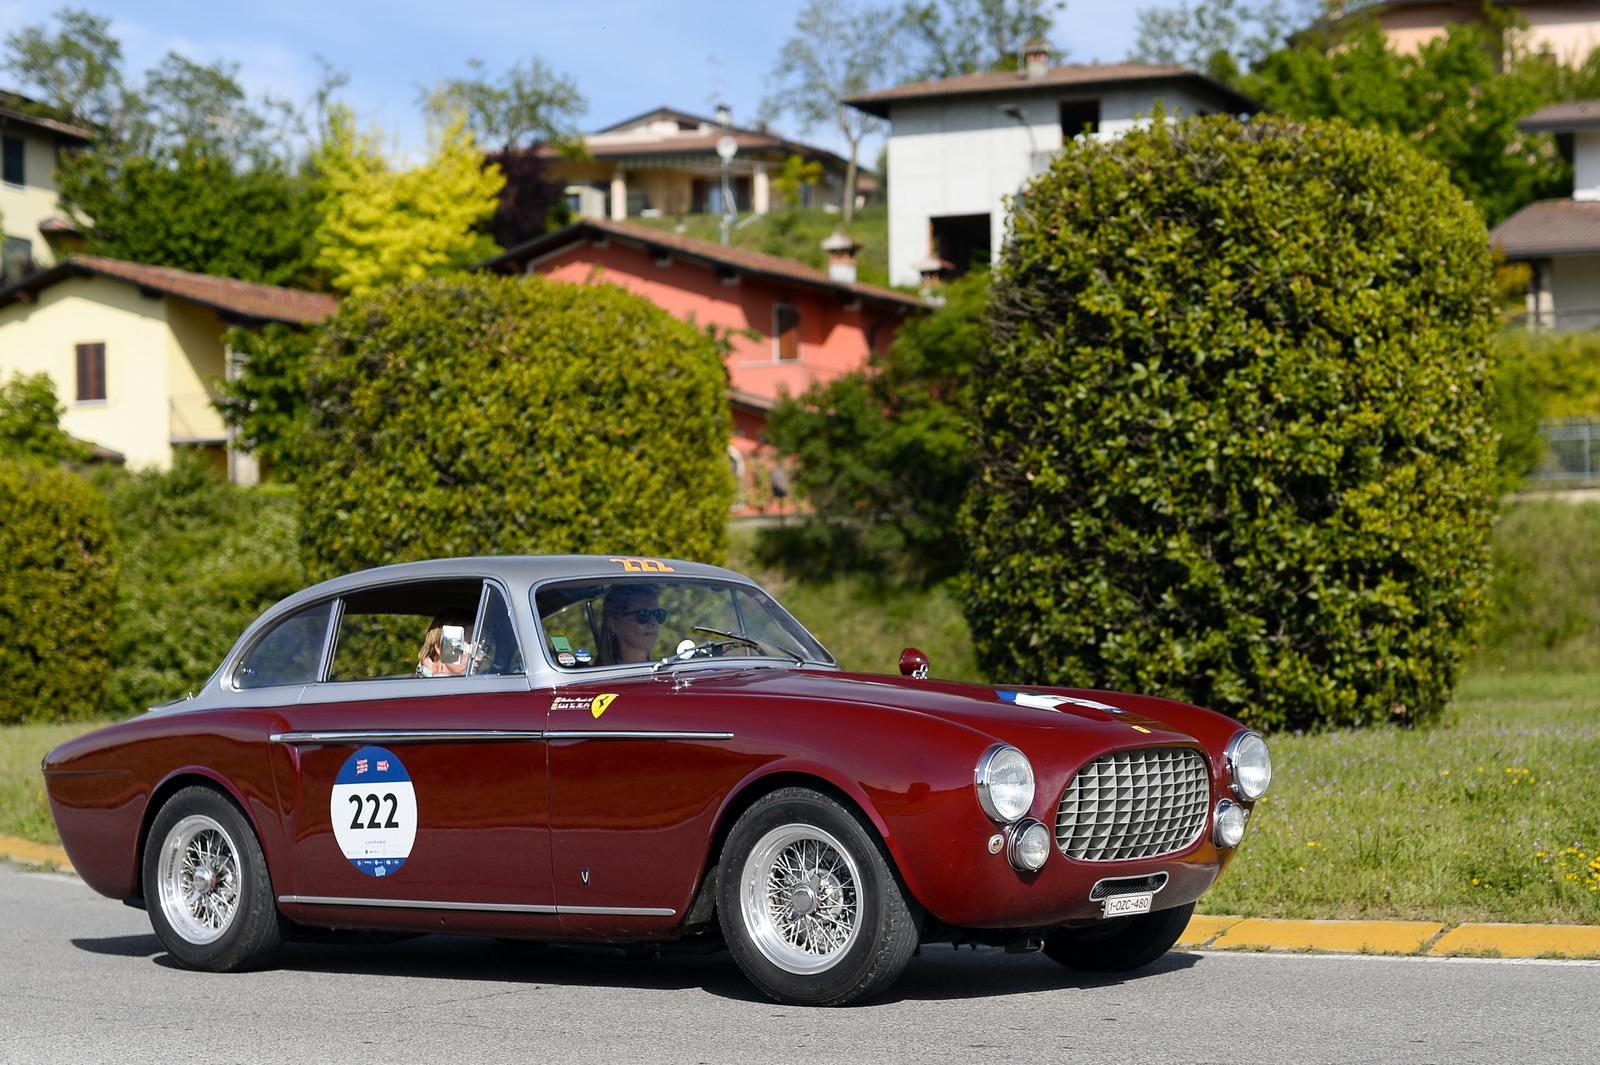 Ferrari 225 S Berlinetta Vignale